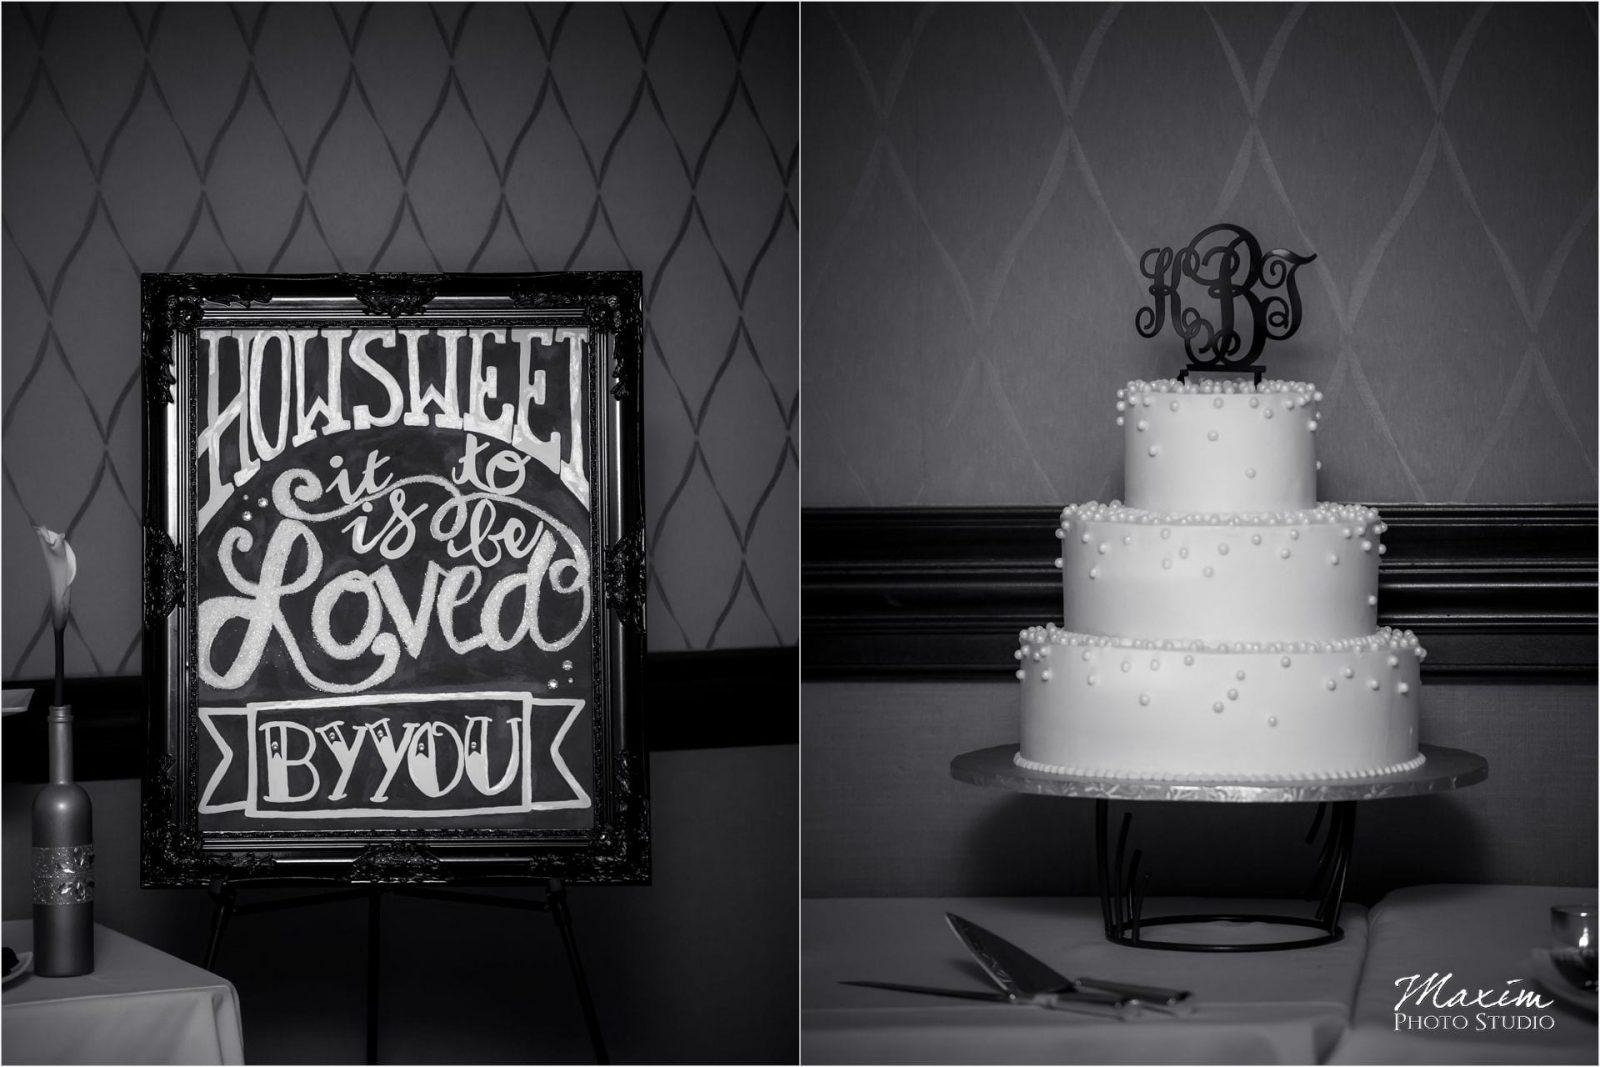 Marriott Rivercenter Covington, Cincinnati Wedding, Reception pictures